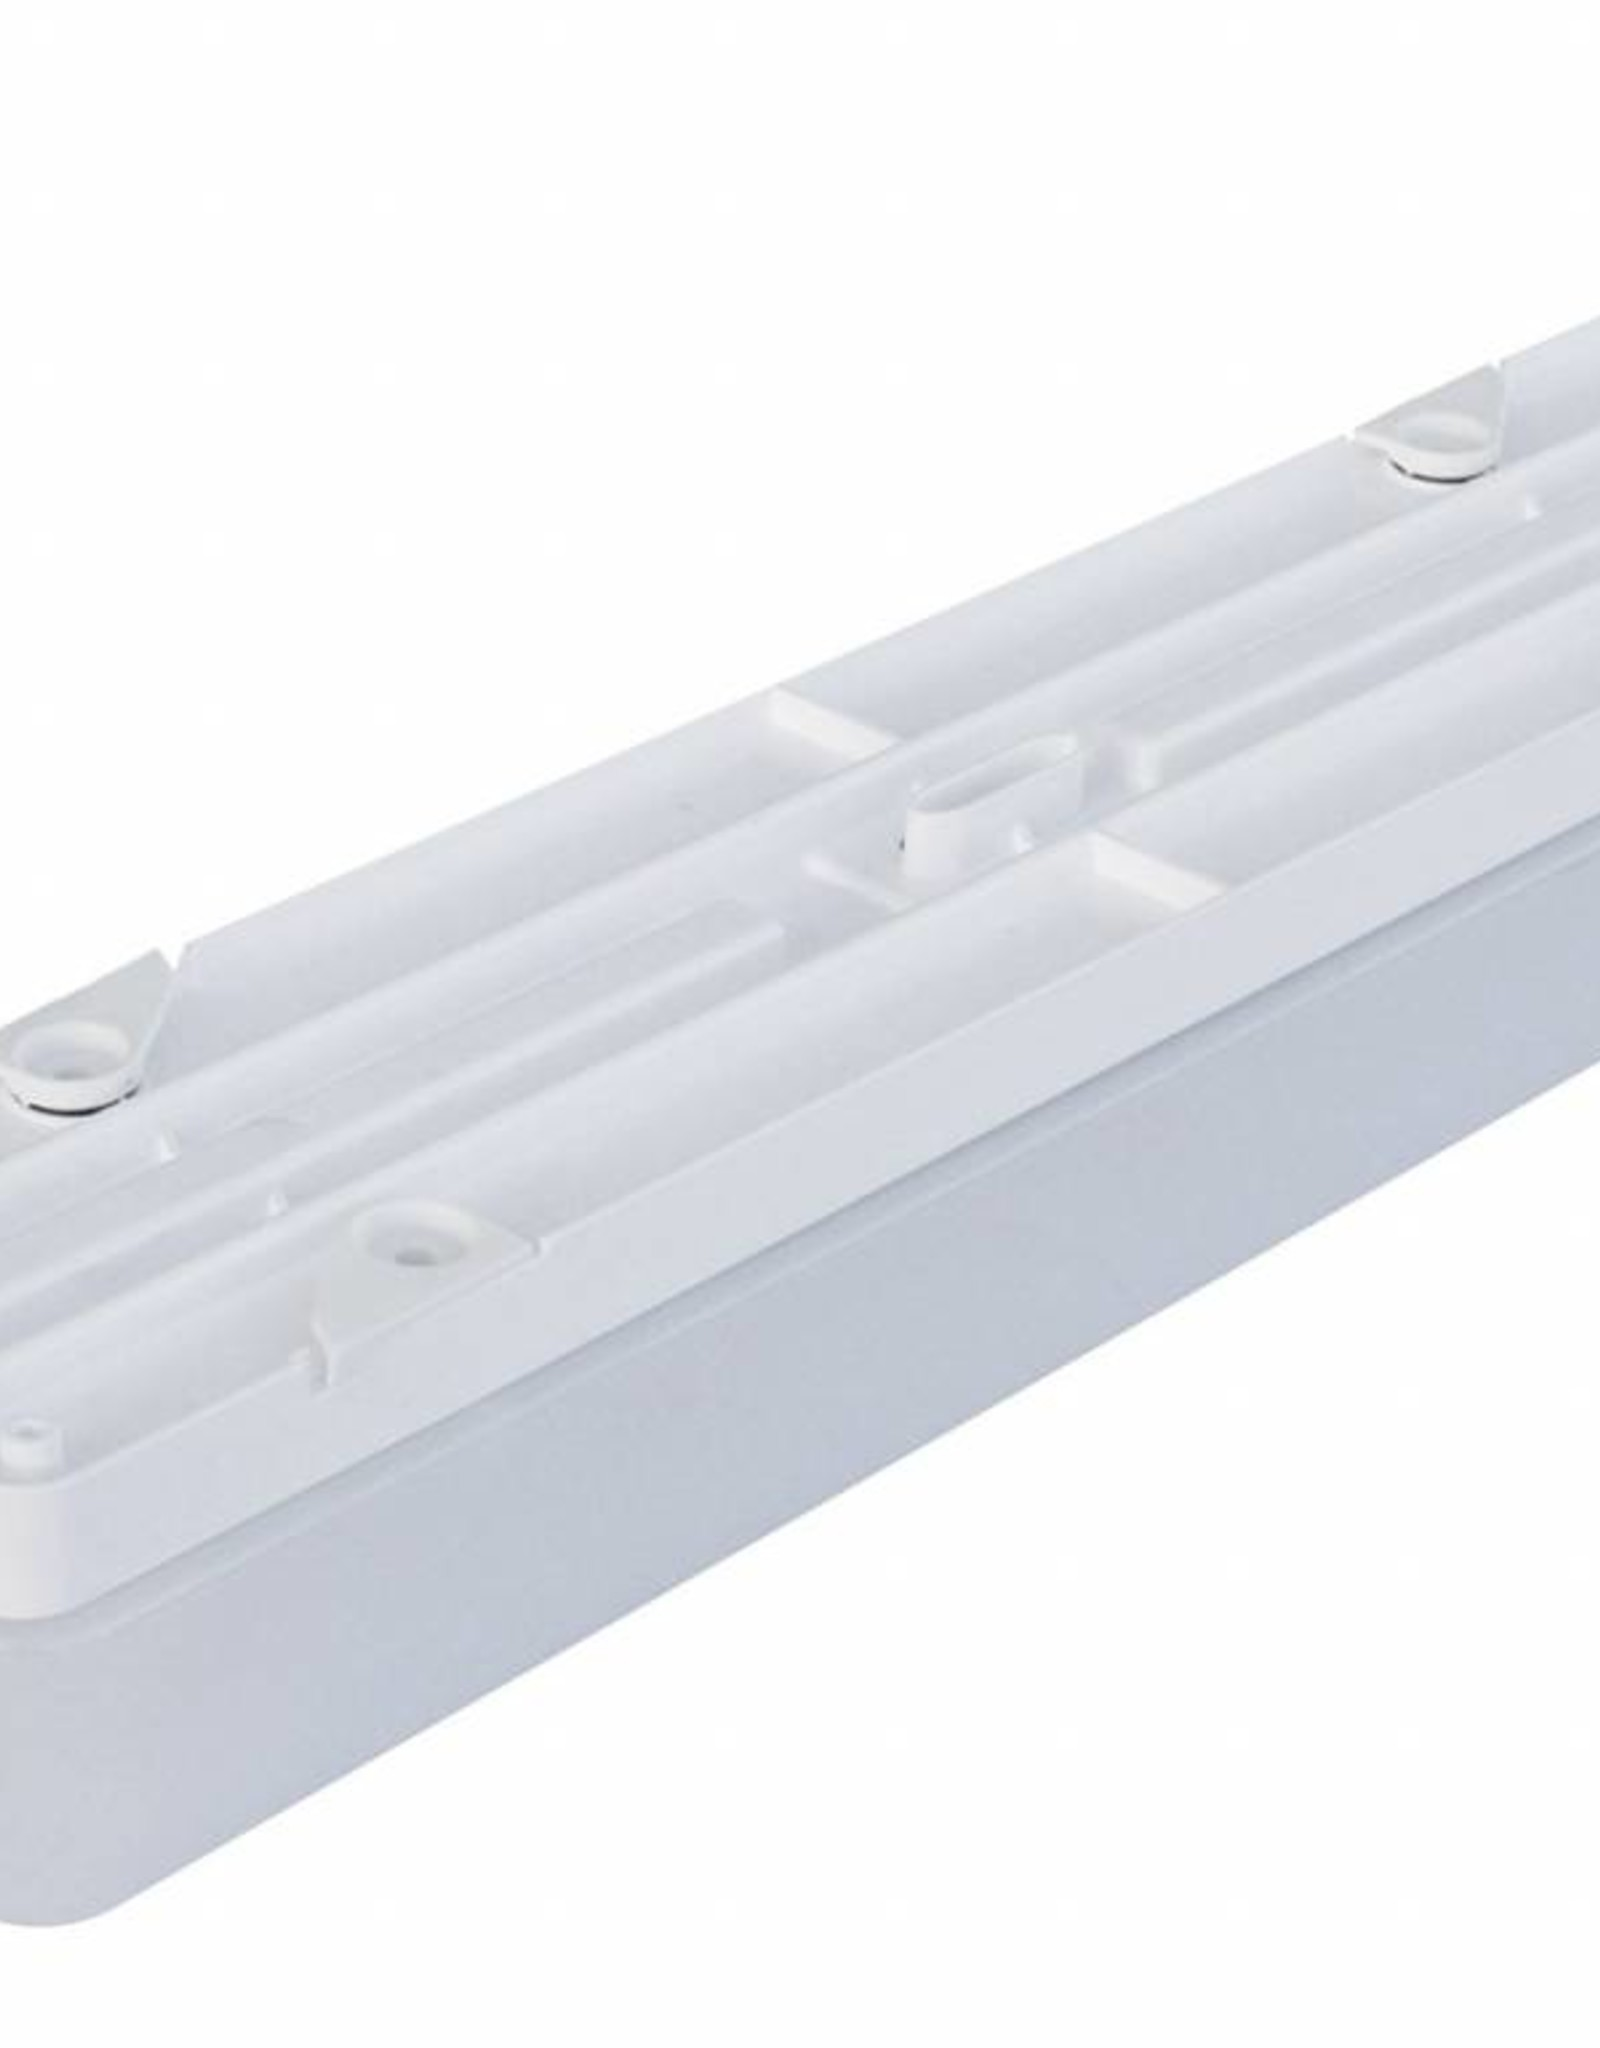 Linea 2.4ft 5200/840 DALI M1h